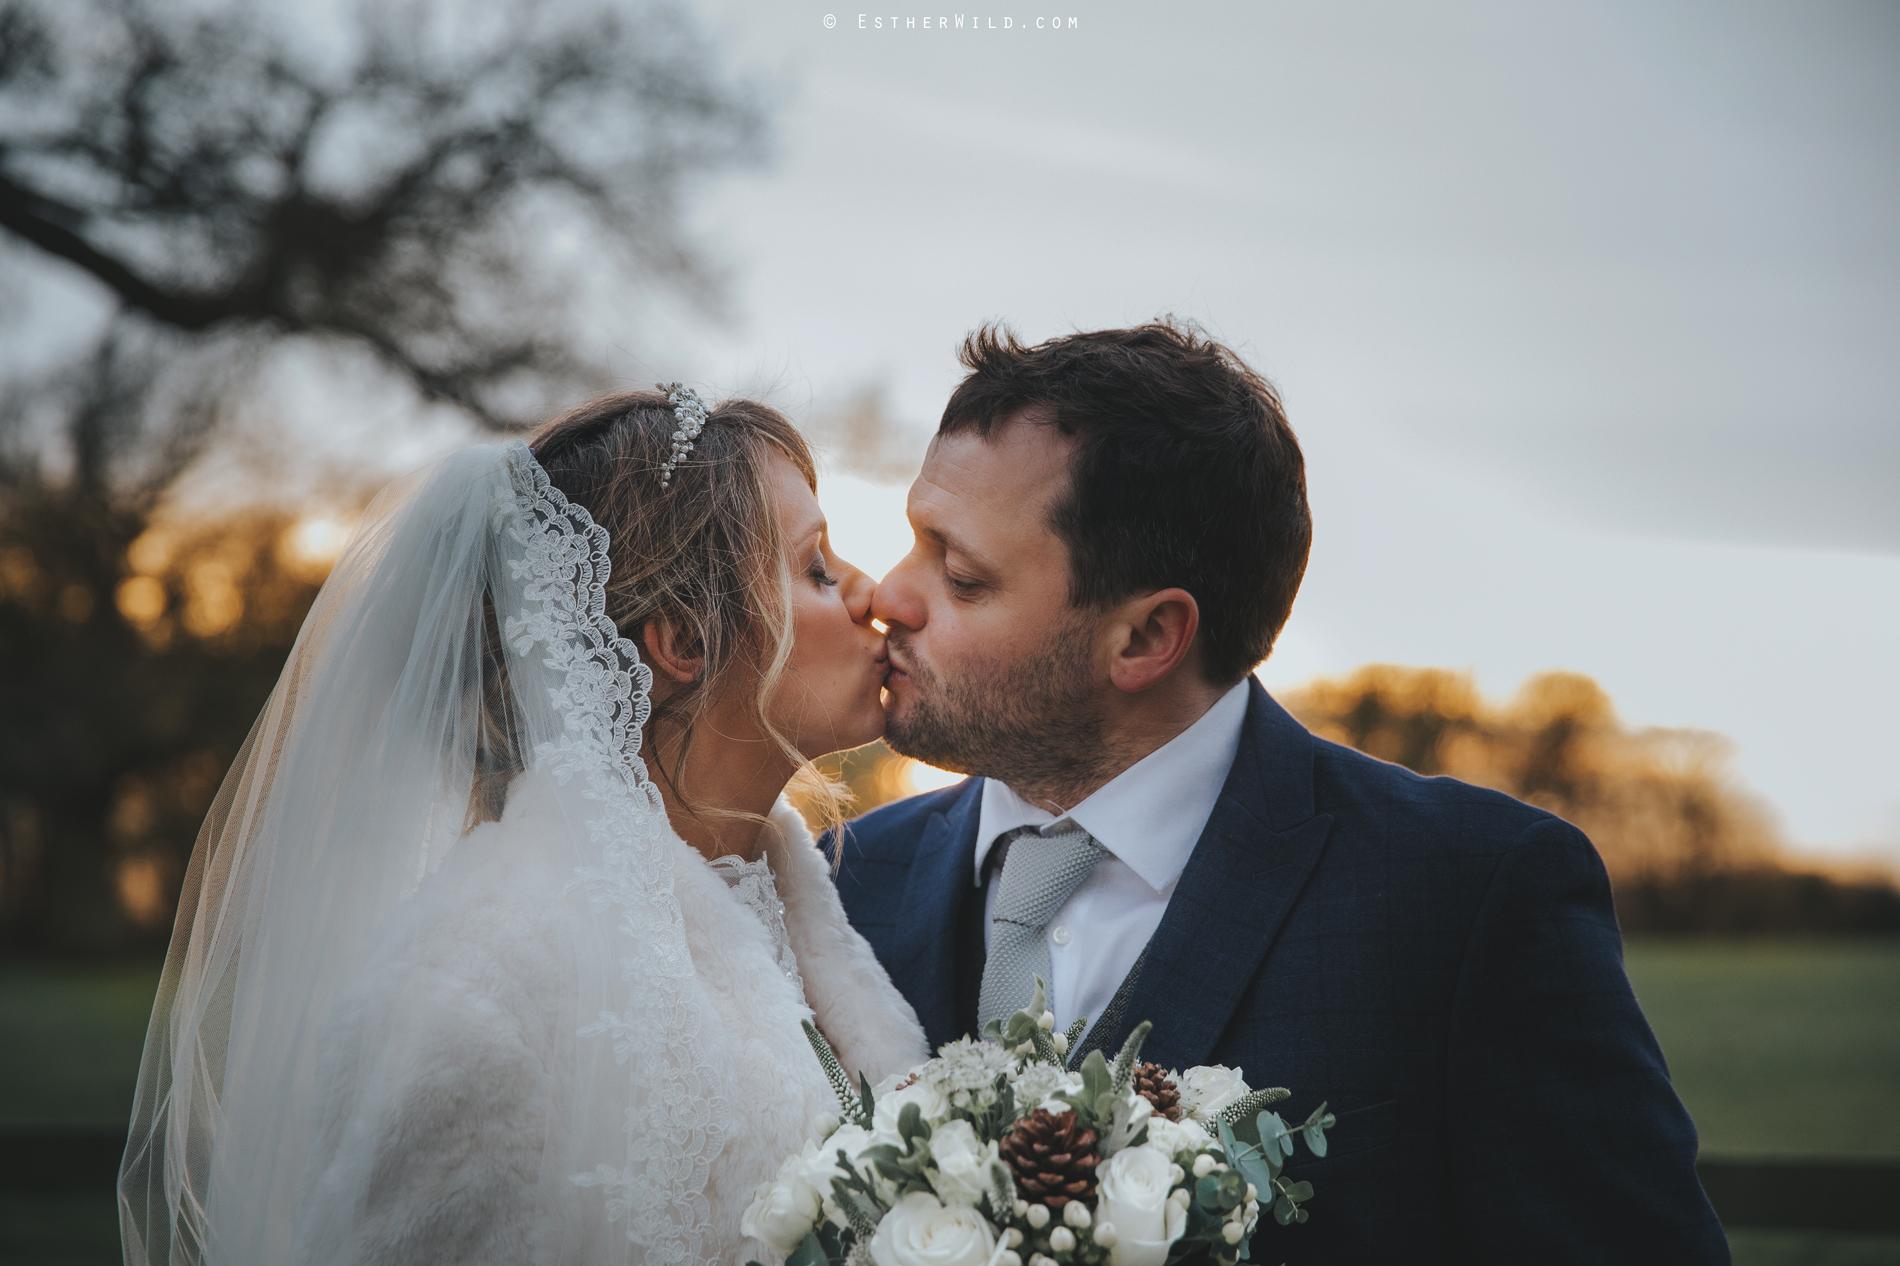 1217_Redenhall_Harleston_Norfolk_Farmer_Wedding_Esther_Wild_IMG_1859.jpg